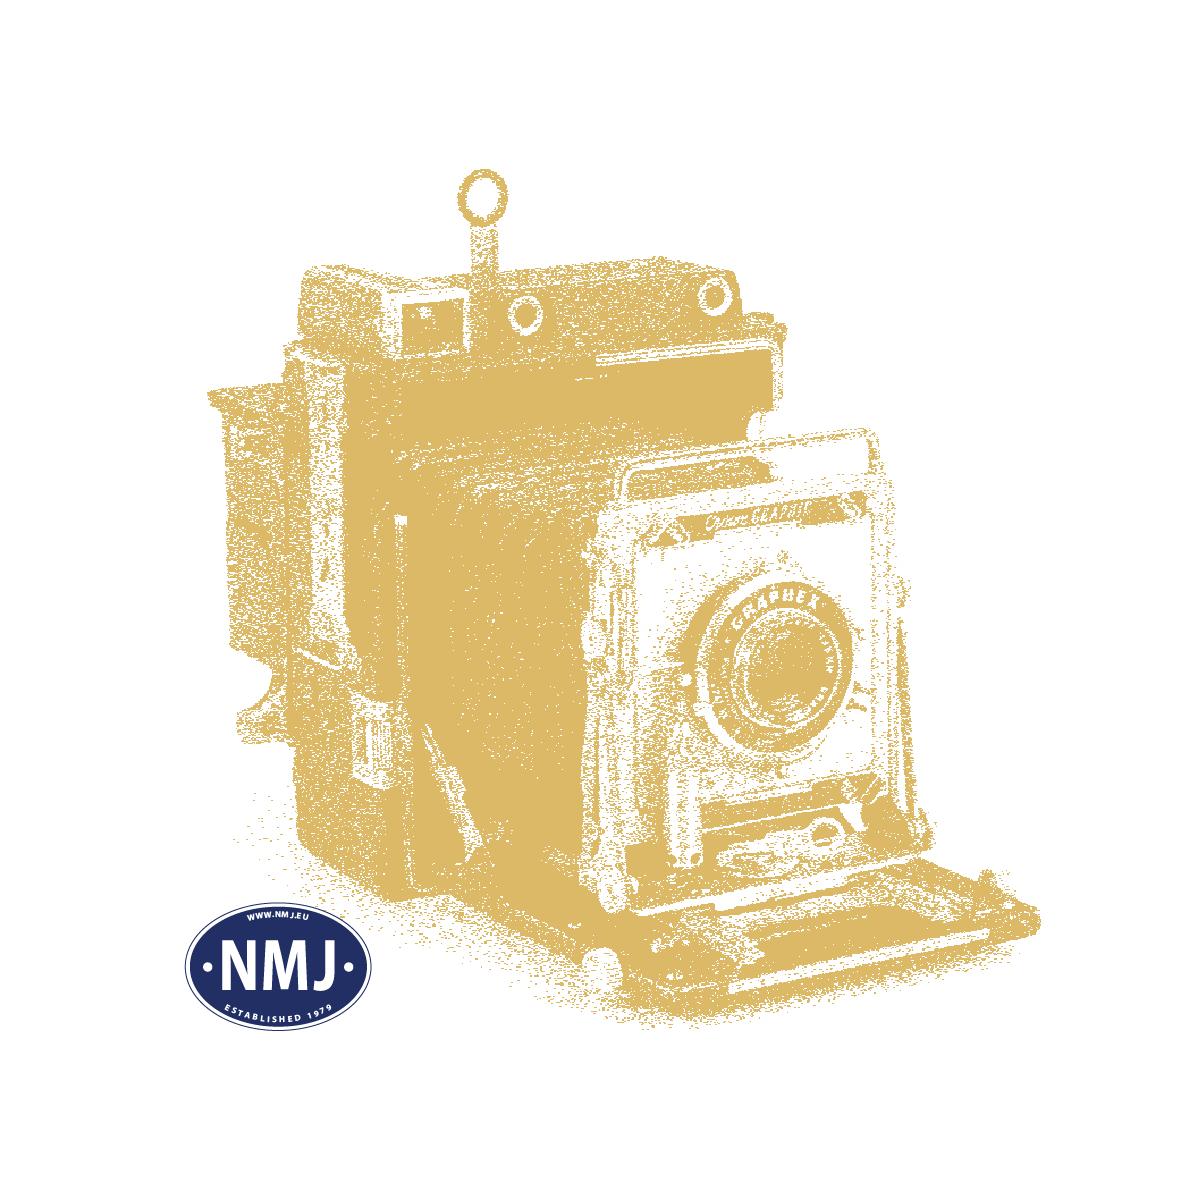 MRHGT-103 - Mr. Tweezers Parts Holder w/ Lock Mechanism